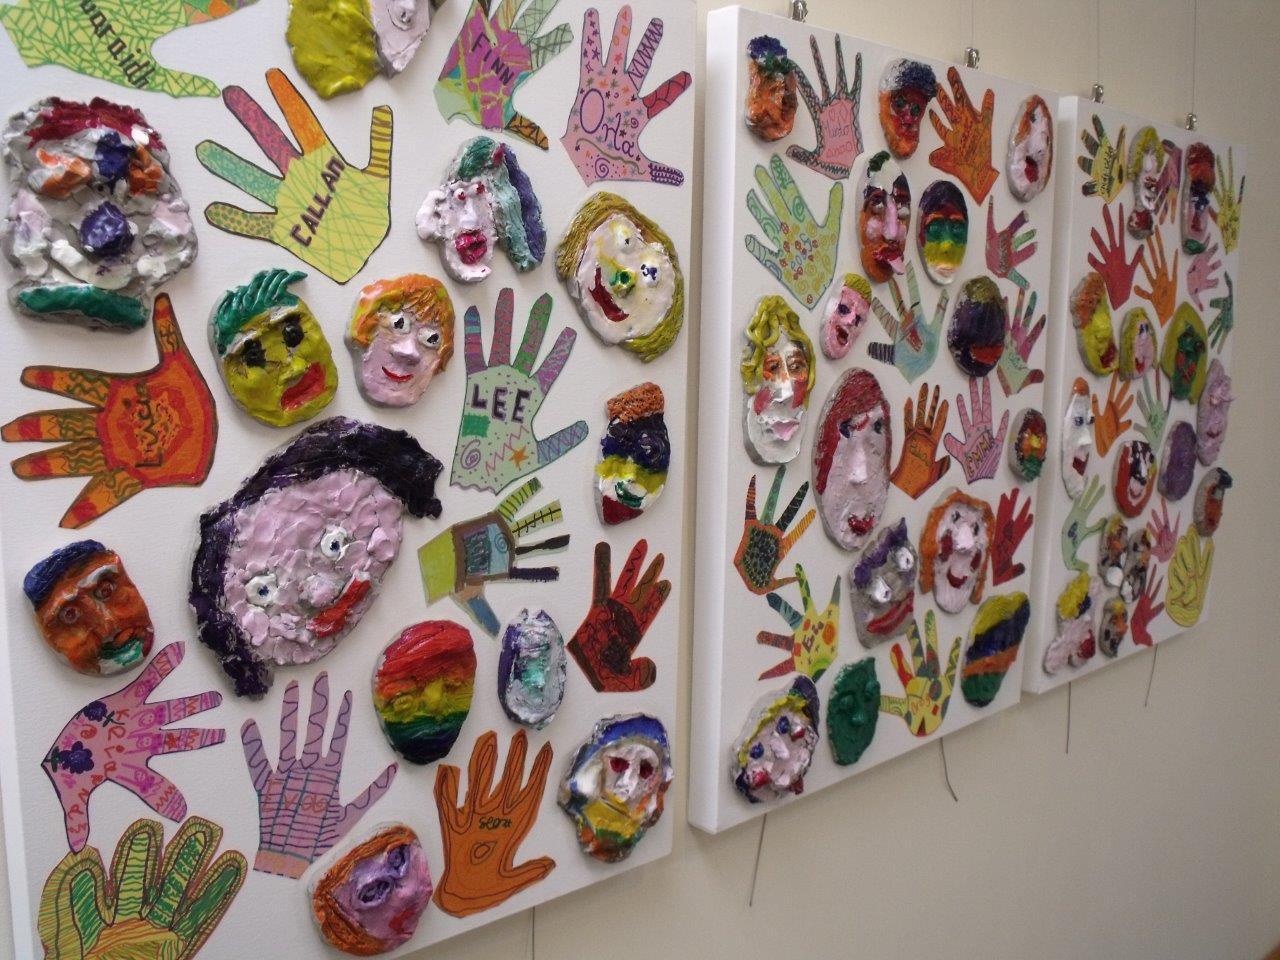 Mallaig Summer Play scheme Artwork